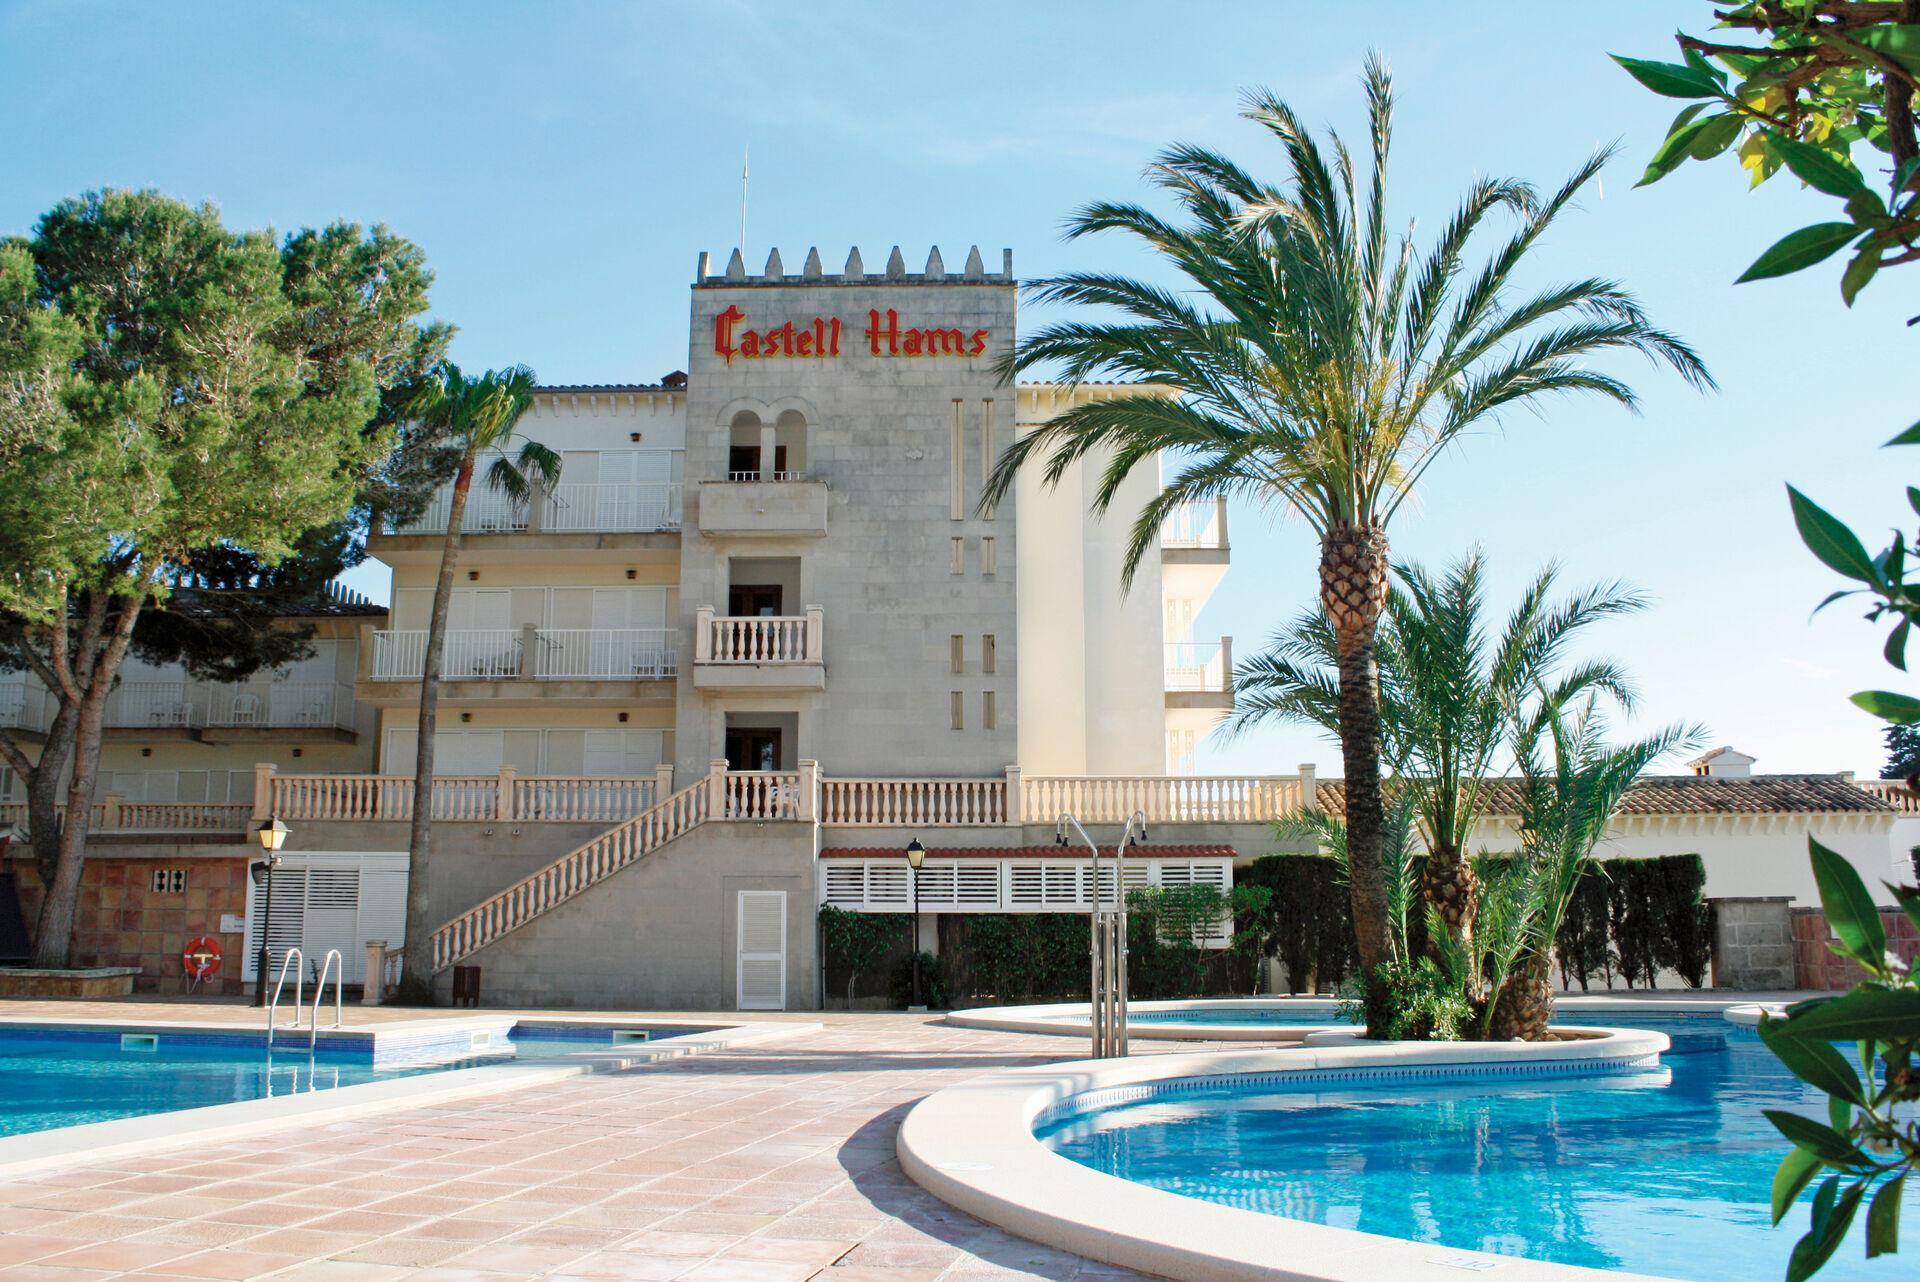 Club Castell dels Hams - chambre double